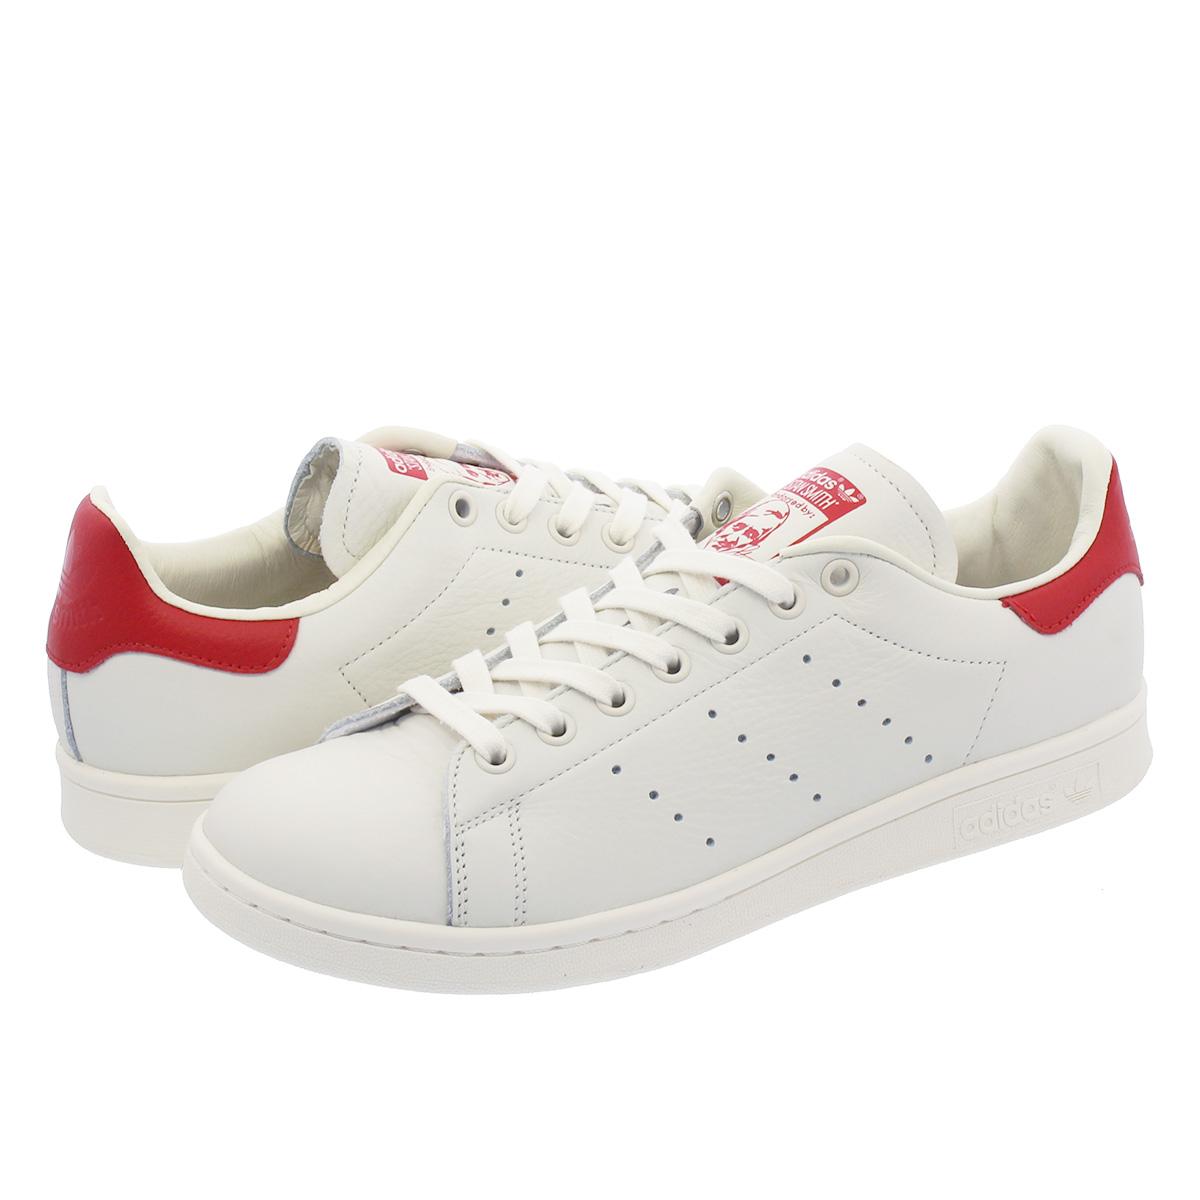 LOWTEX BIG-SMALL SHOP  adidas STAN SMITH Adidas Stan Smith CHALK ... 20d3d9223